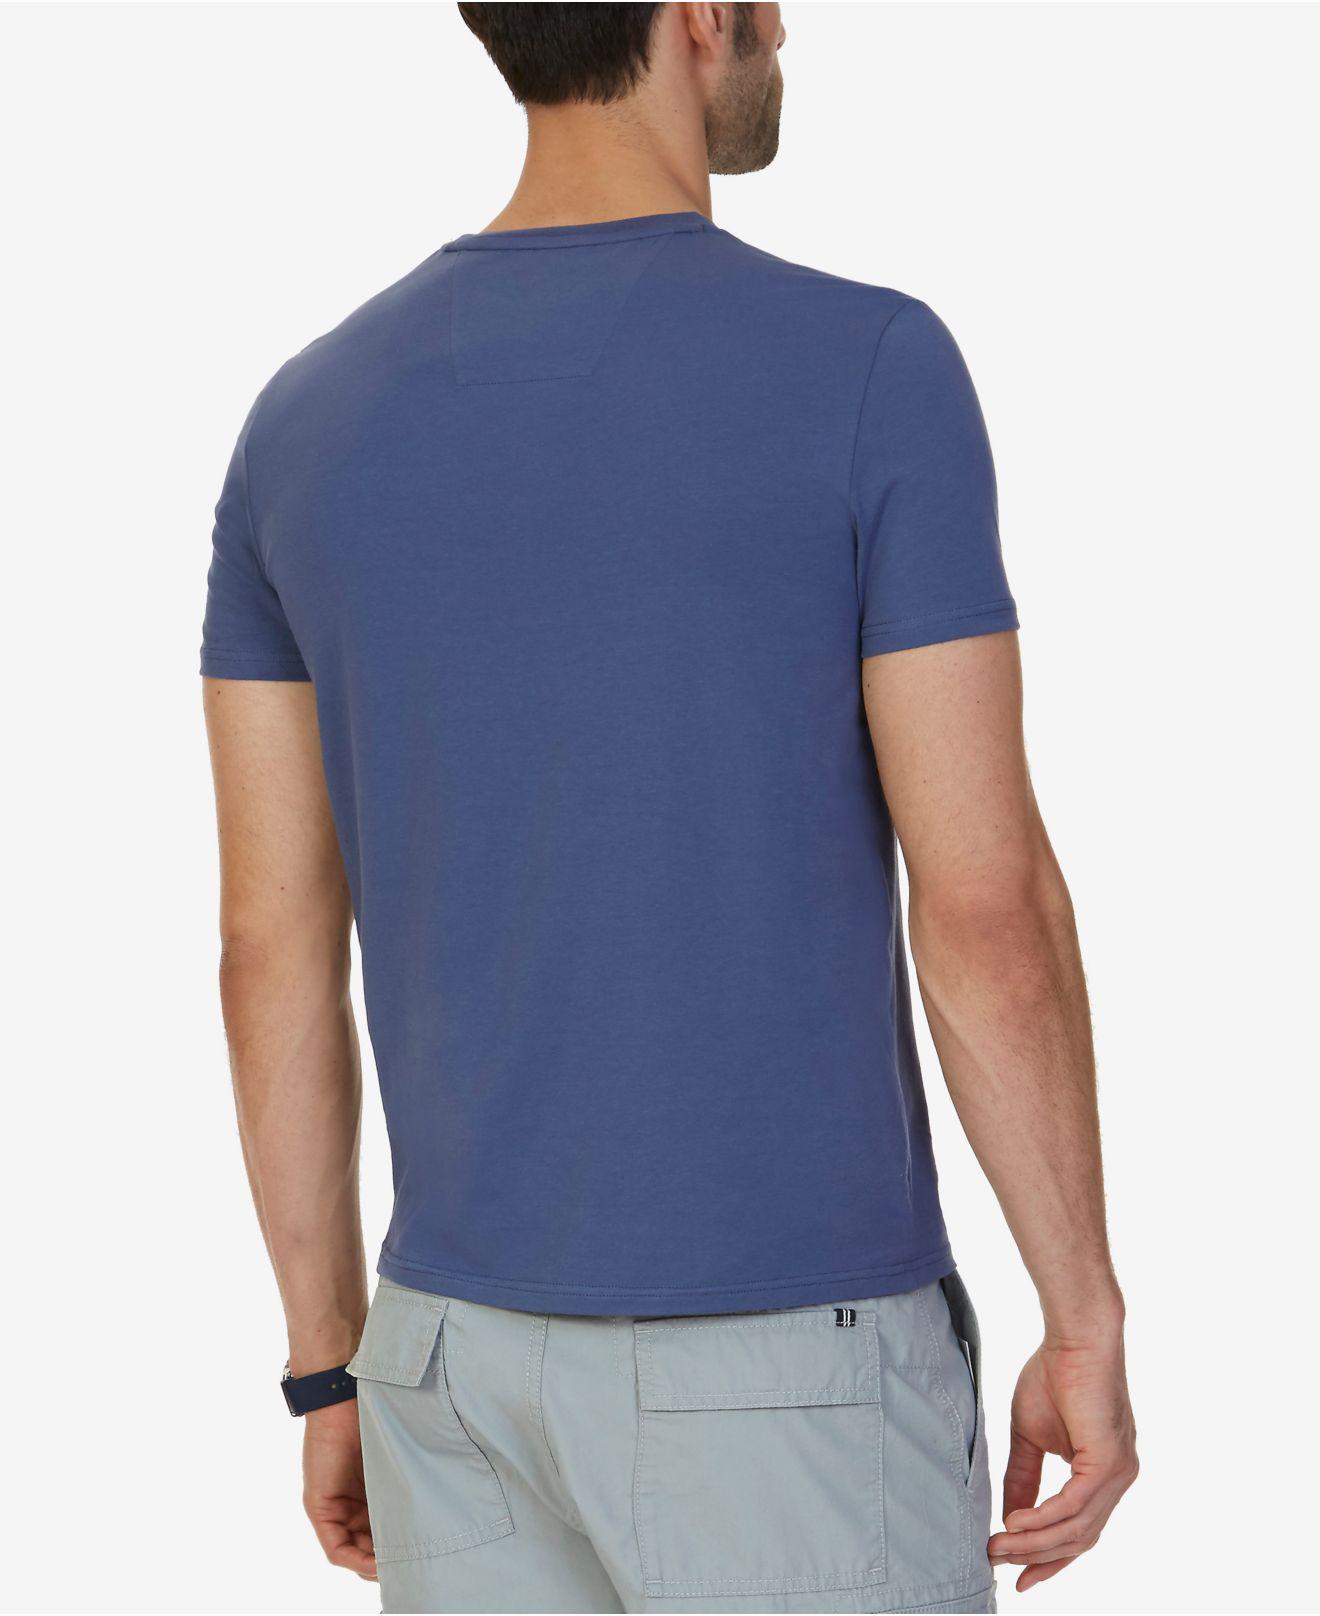 ee07b1d9 Mens T Shirt Nike Nasa Worm Navy